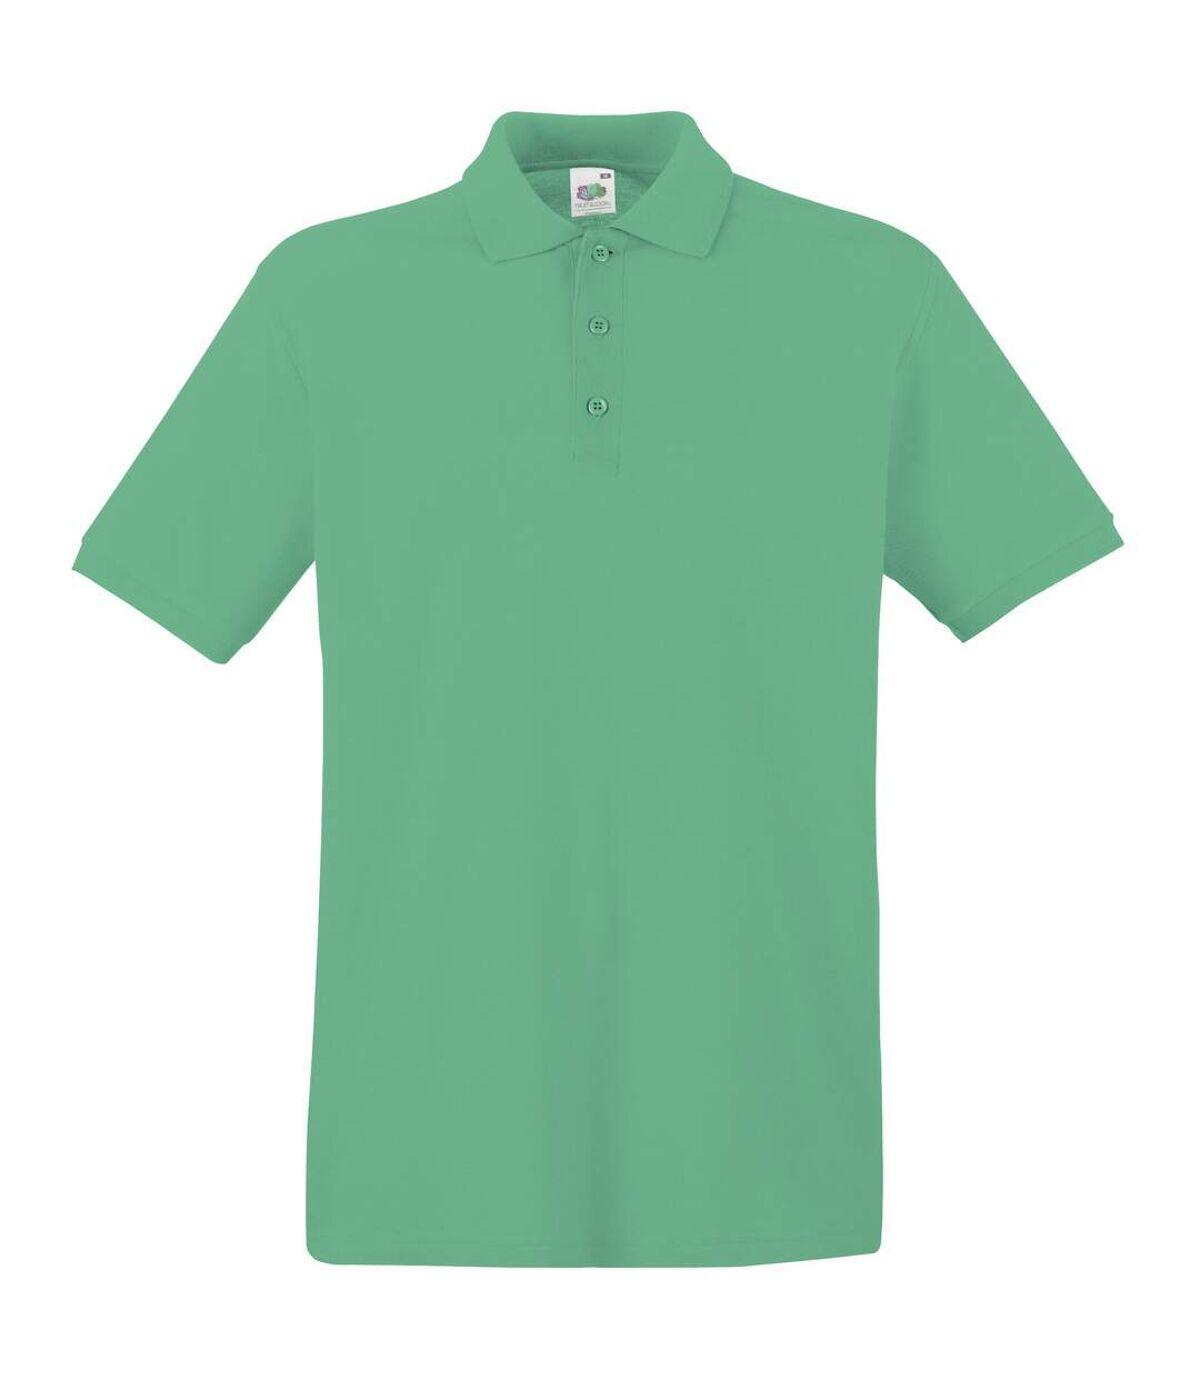 Fruit Of The Loom Premium Mens Short Sleeve Polo Shirt (Orange) - UTBC1381